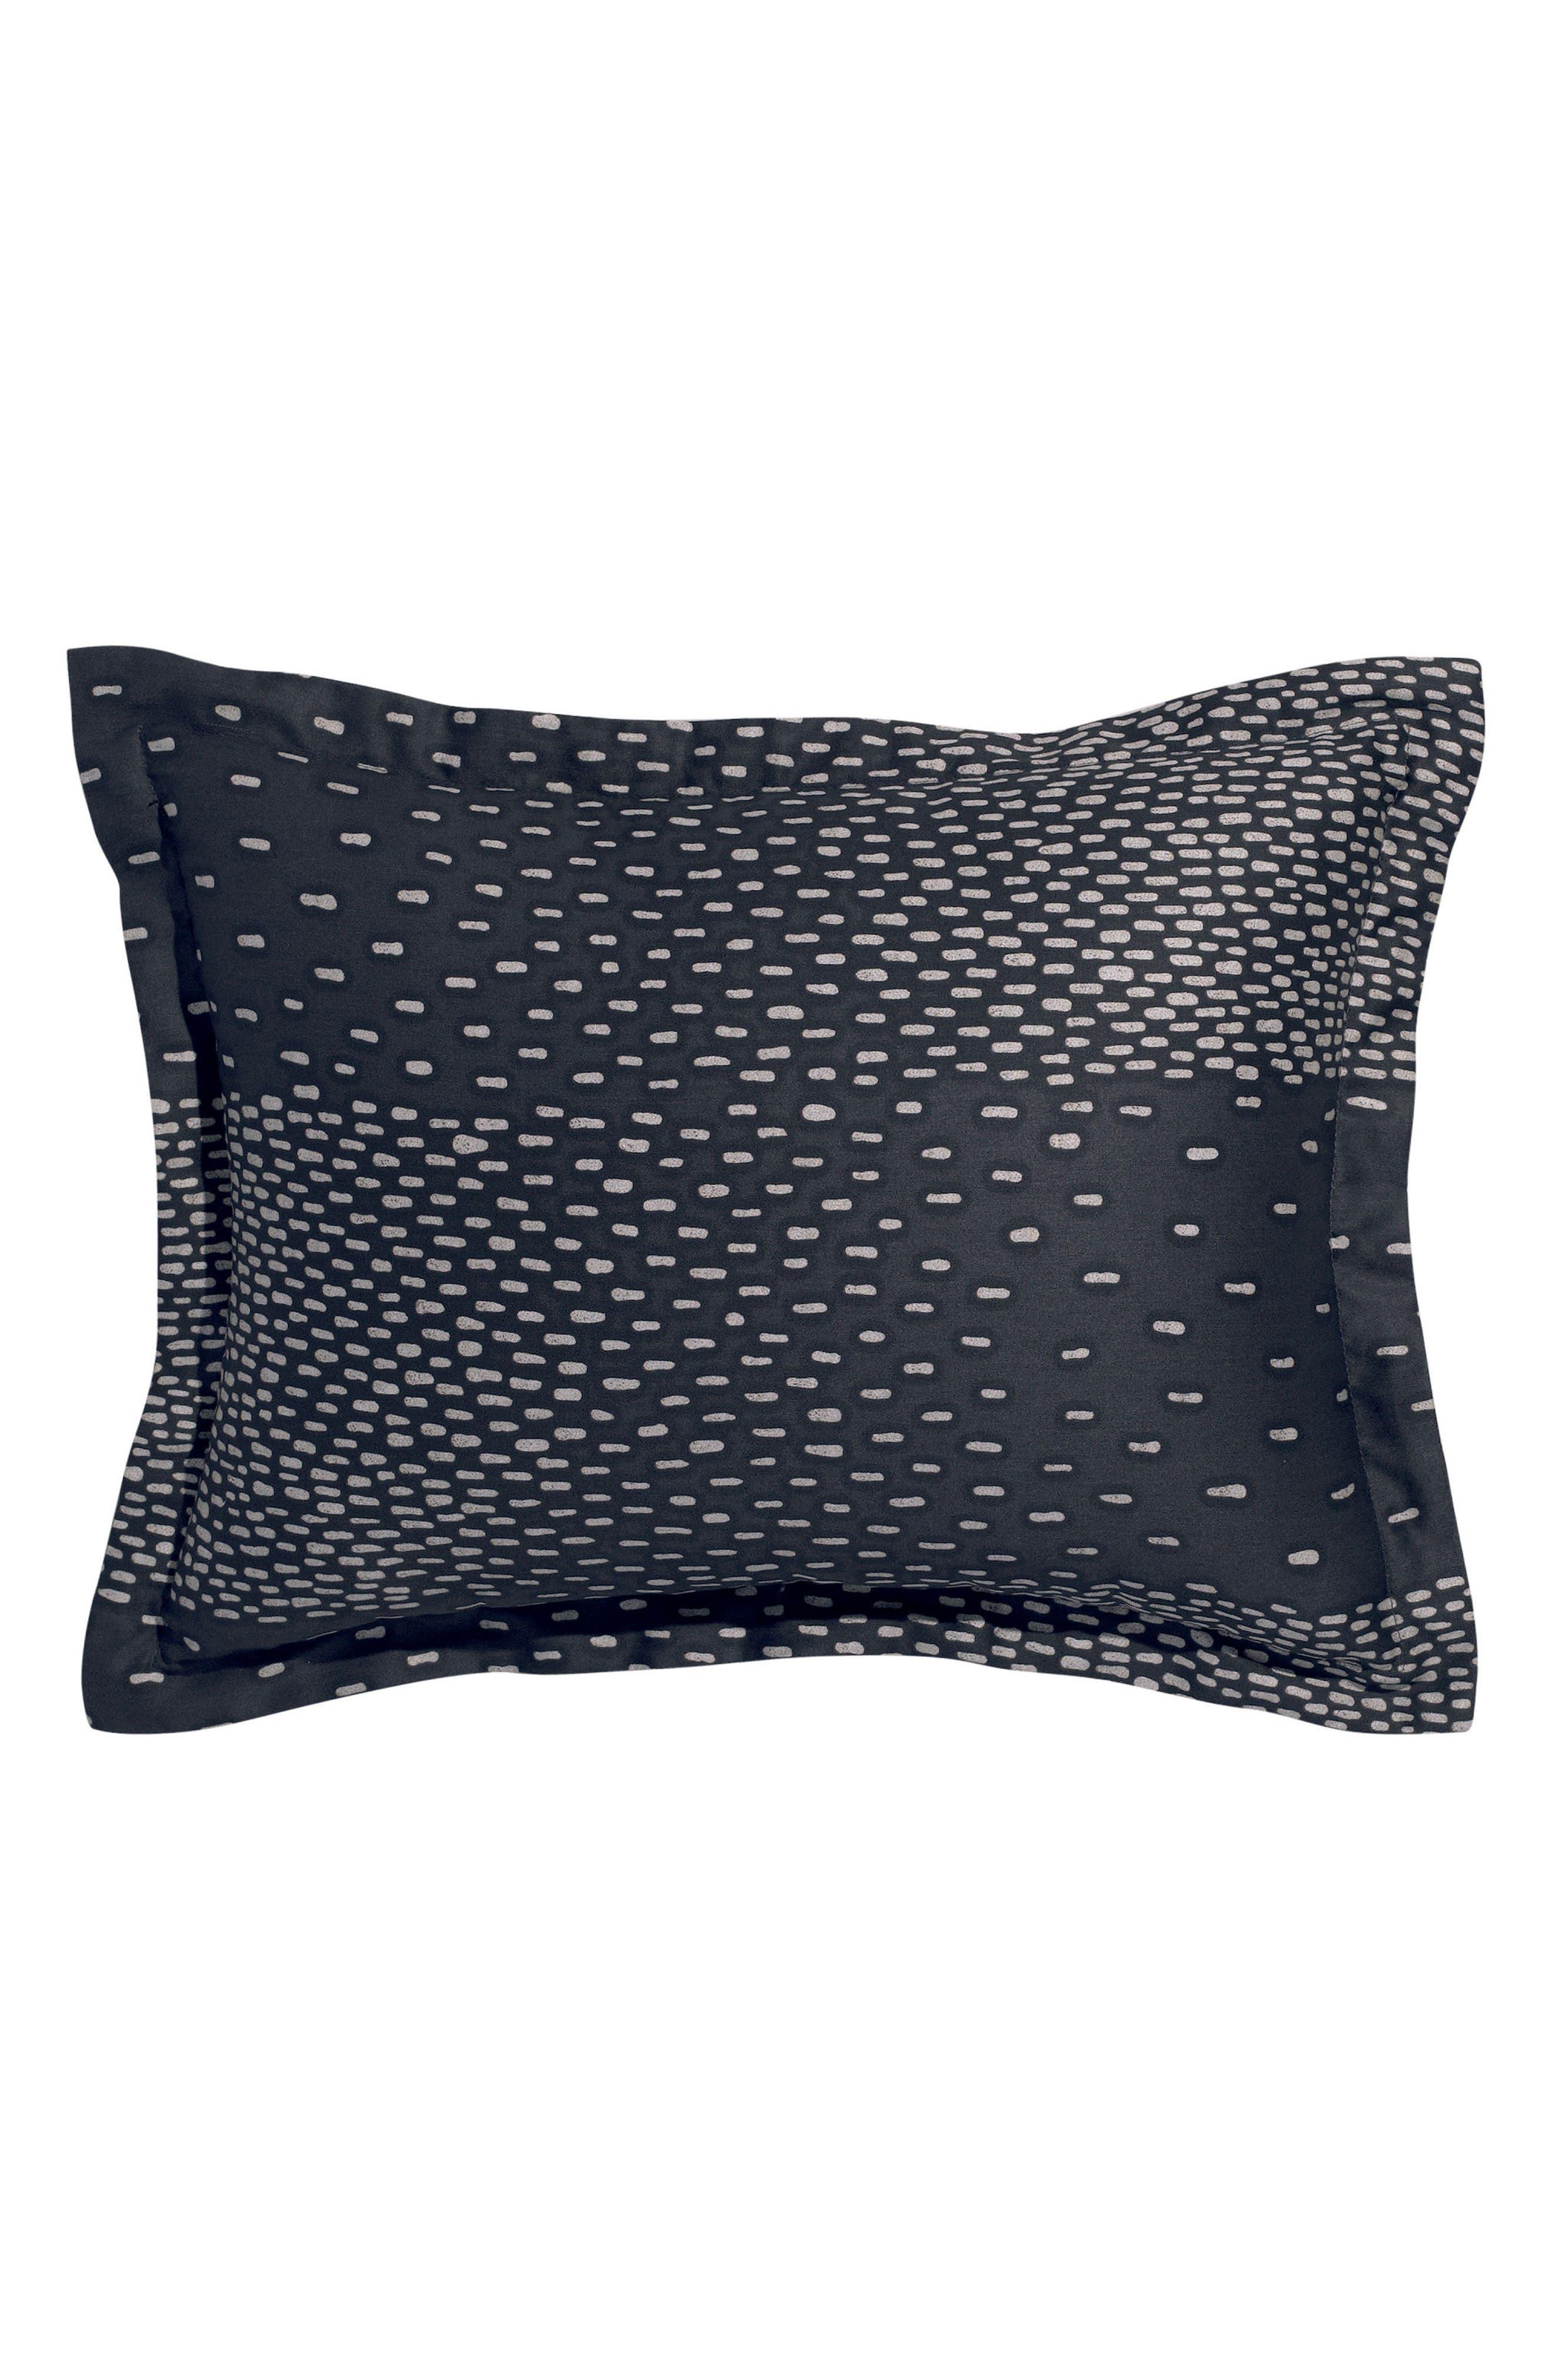 Nova Sky Accent Pillow,                             Main thumbnail 1, color,                             001